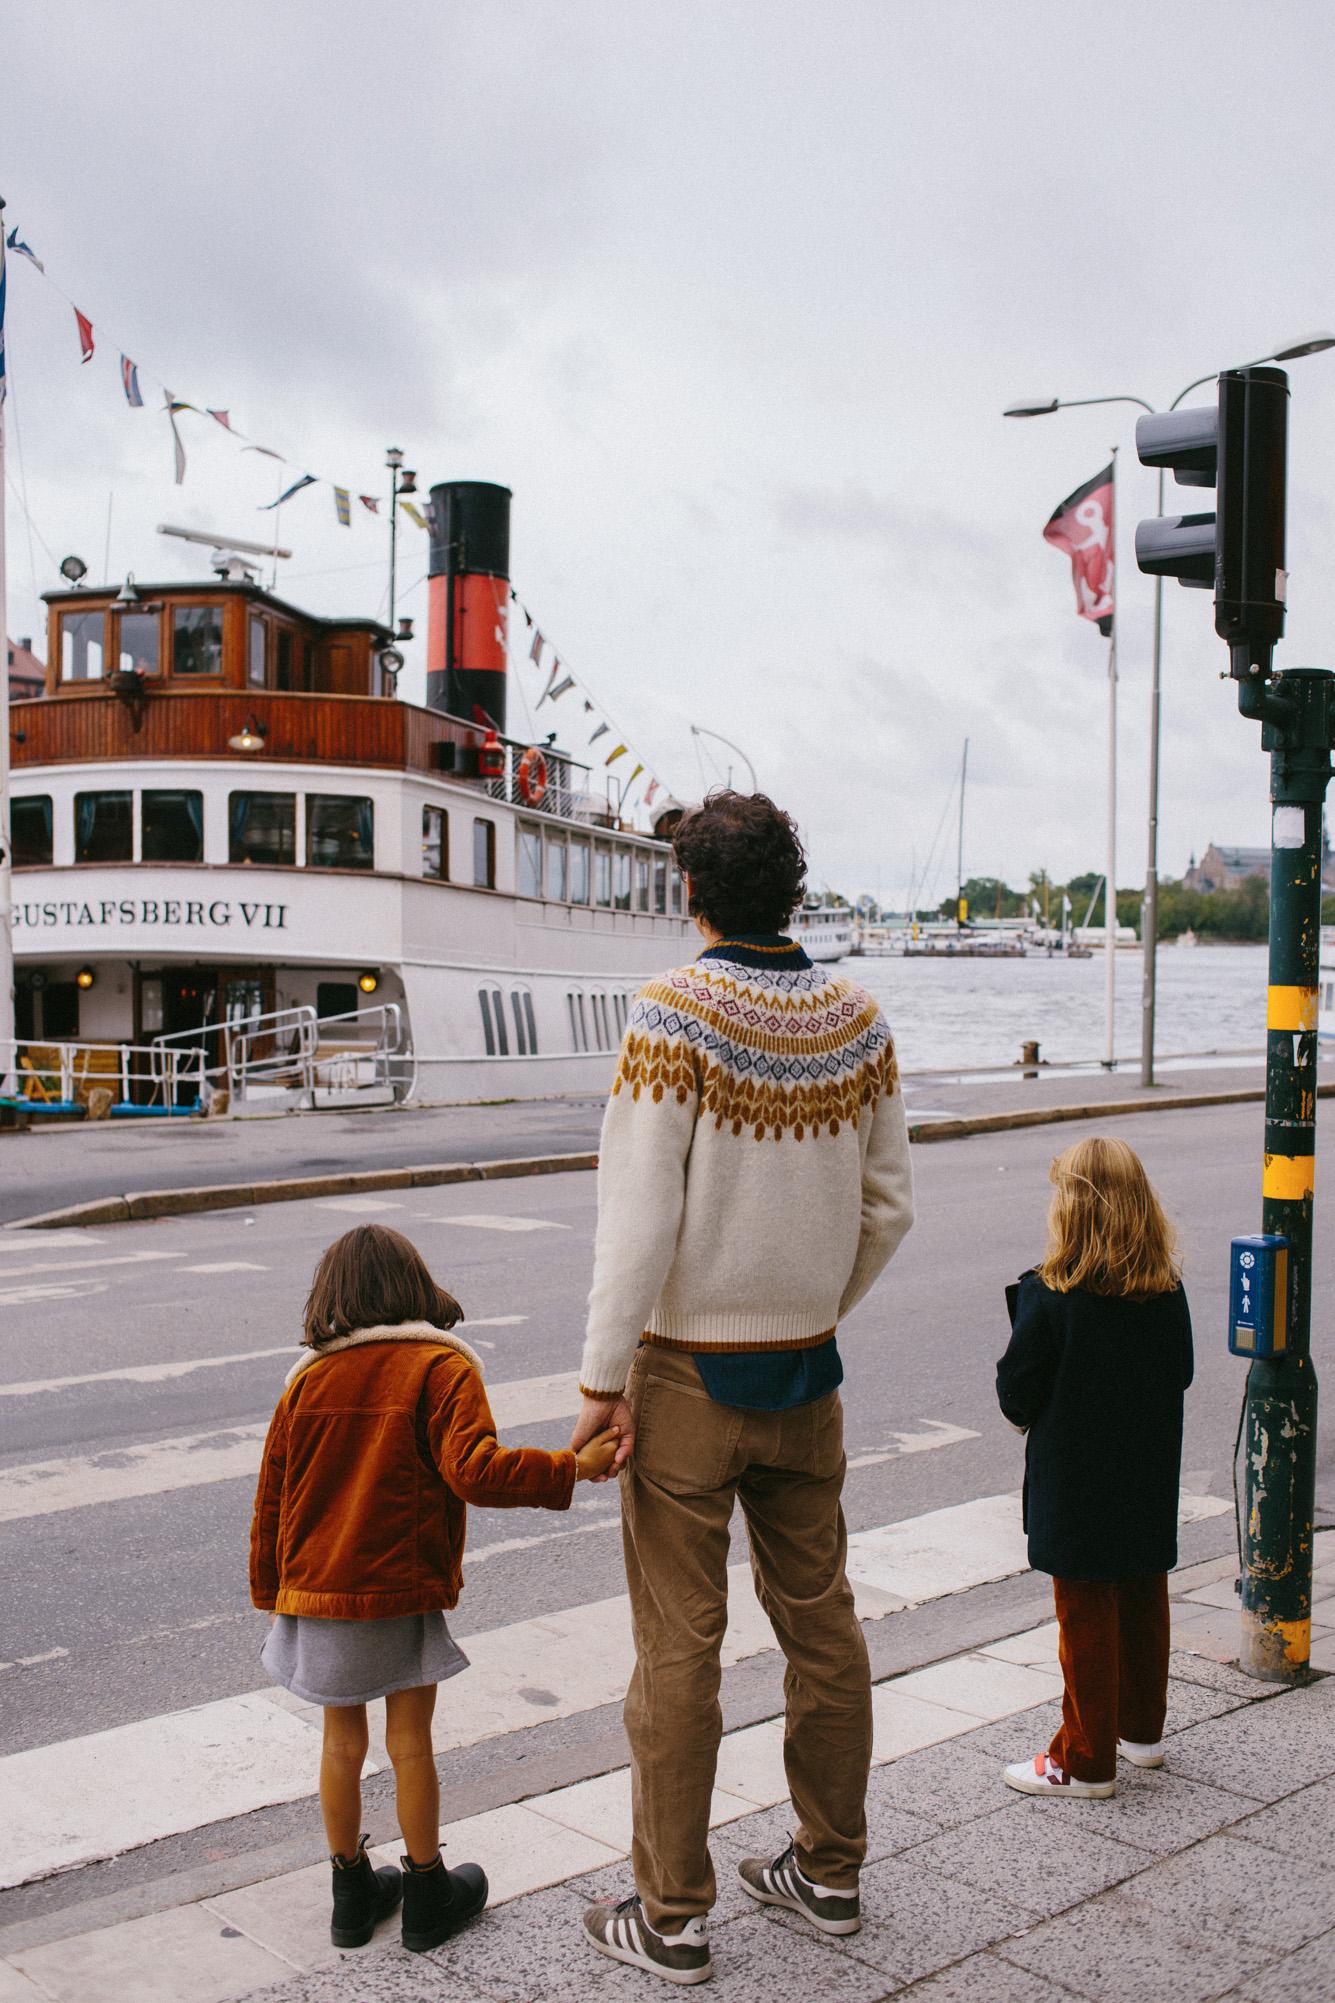 stockholm-kids-cityguide-conbotasdeagua-38.jpg